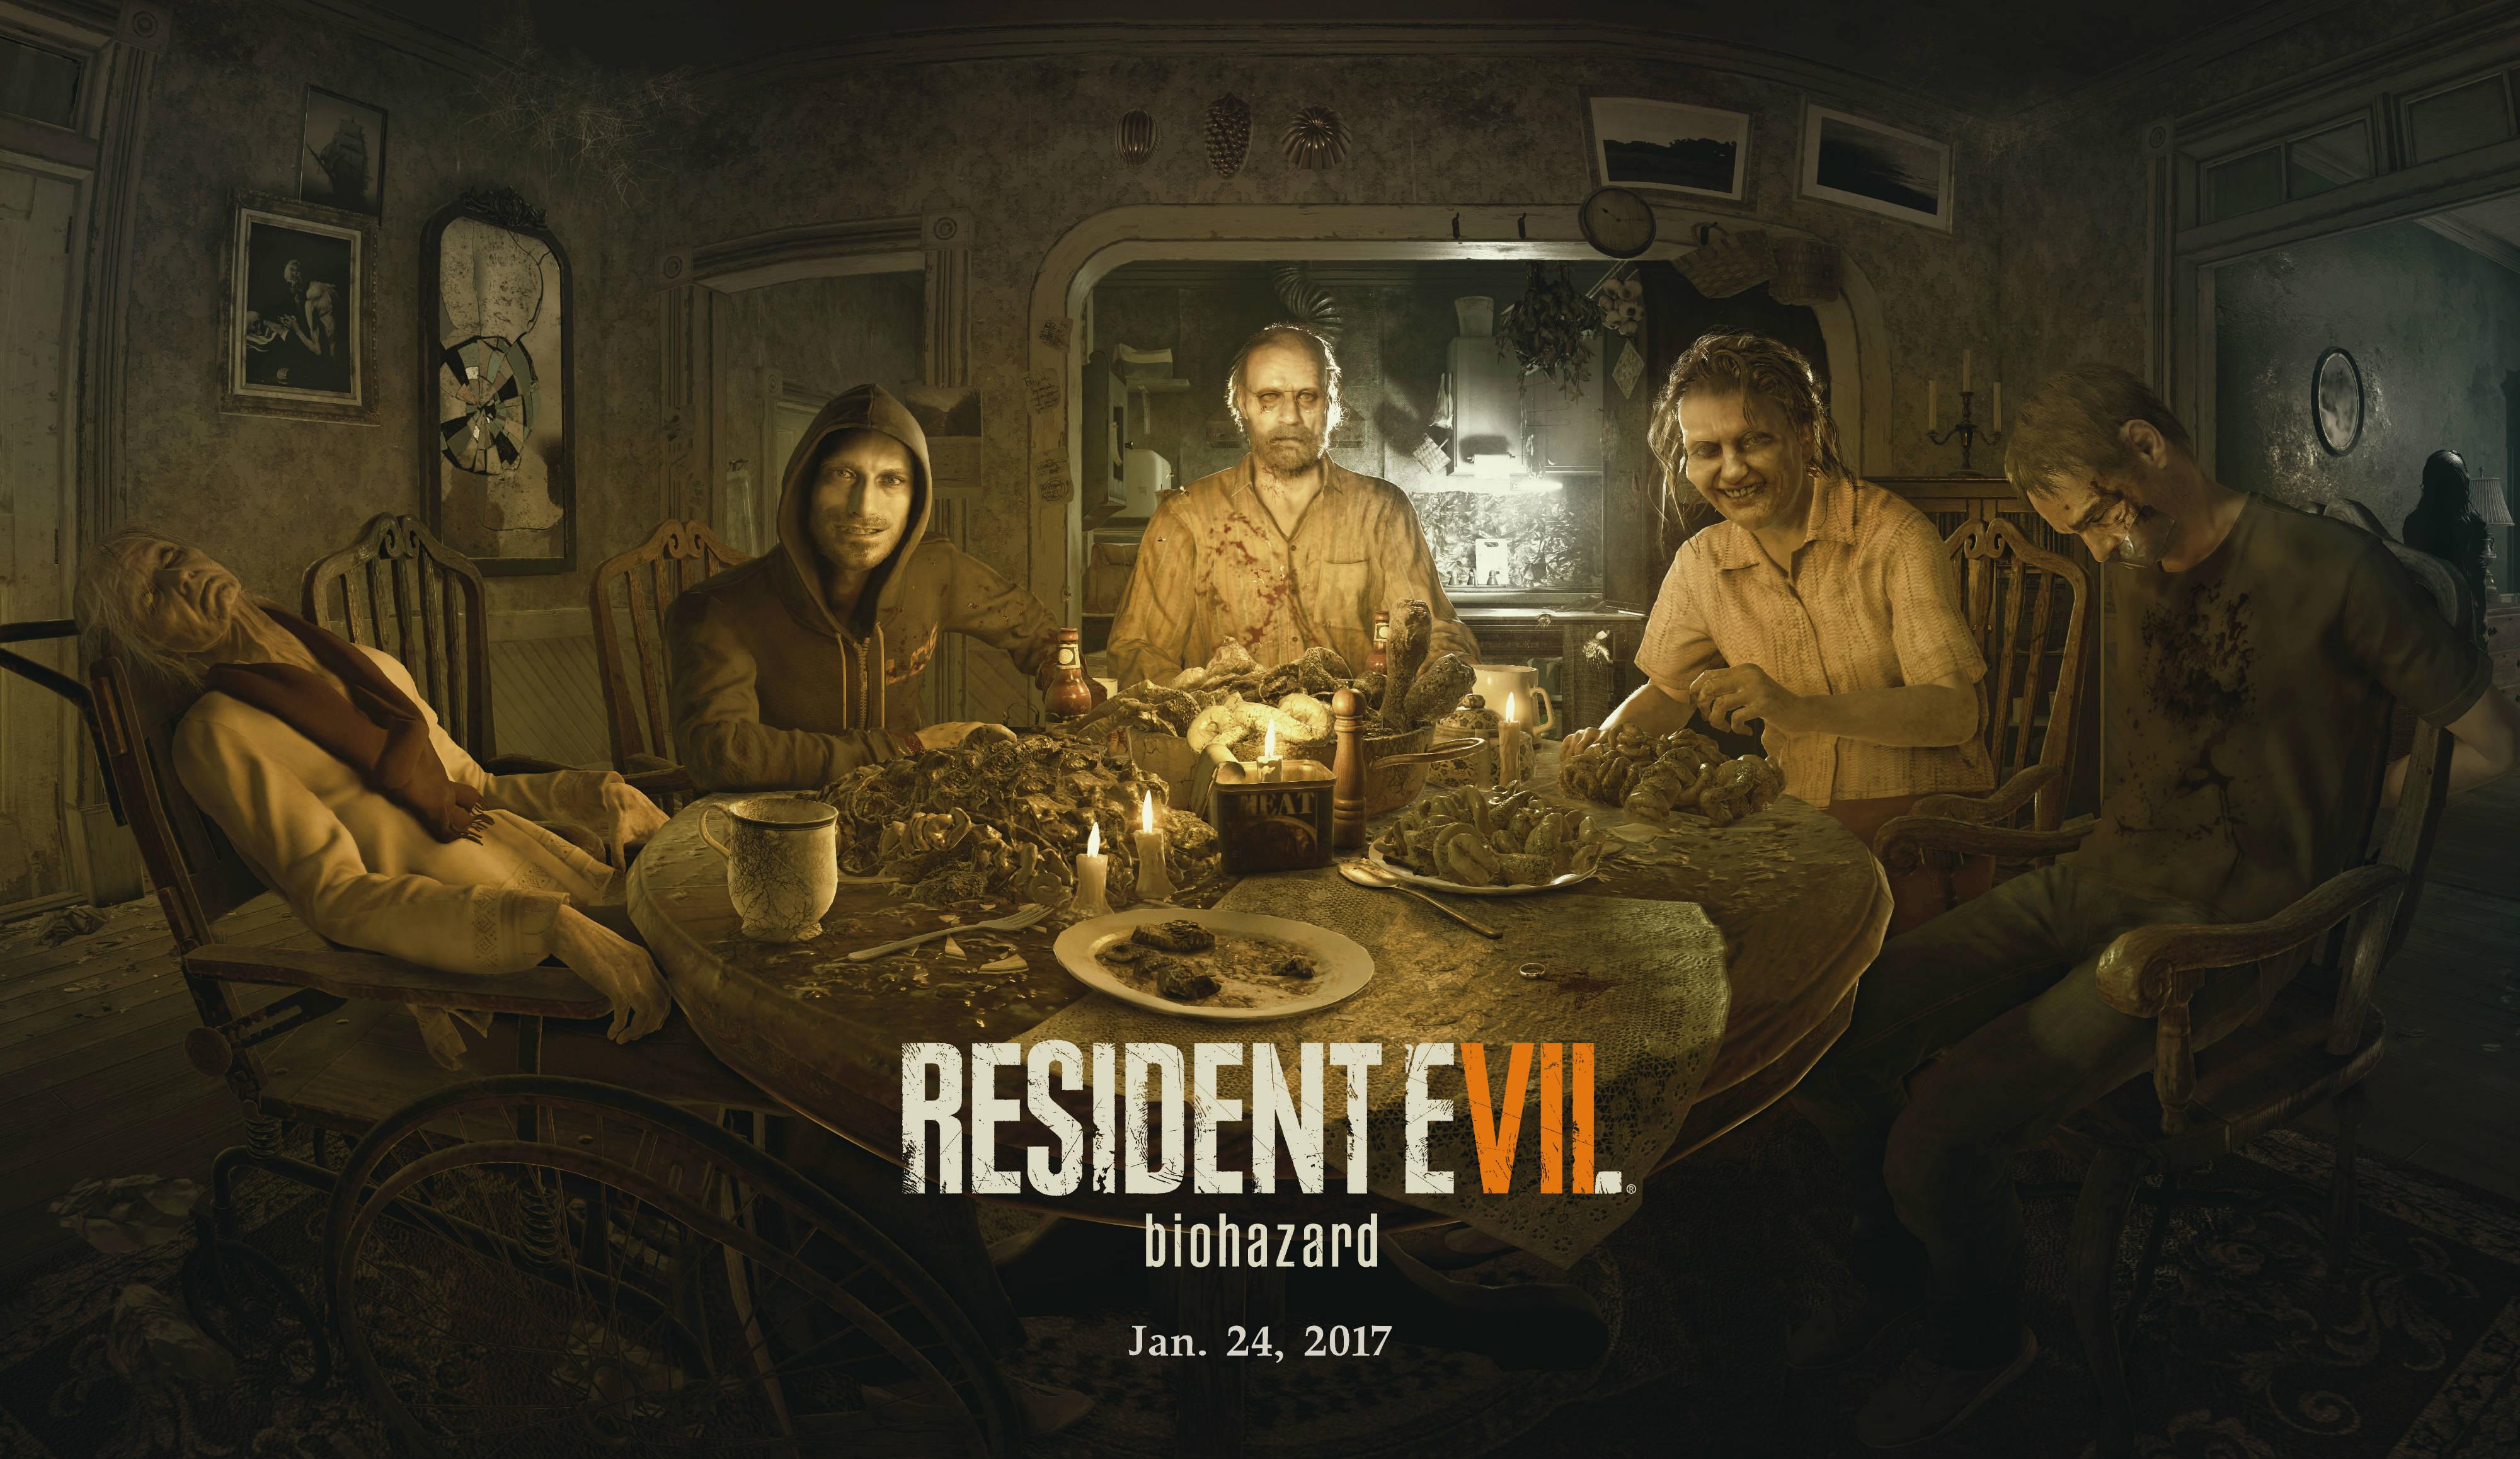 Resultado de imagem para Resident Evil 7: Deluxe Edition pc